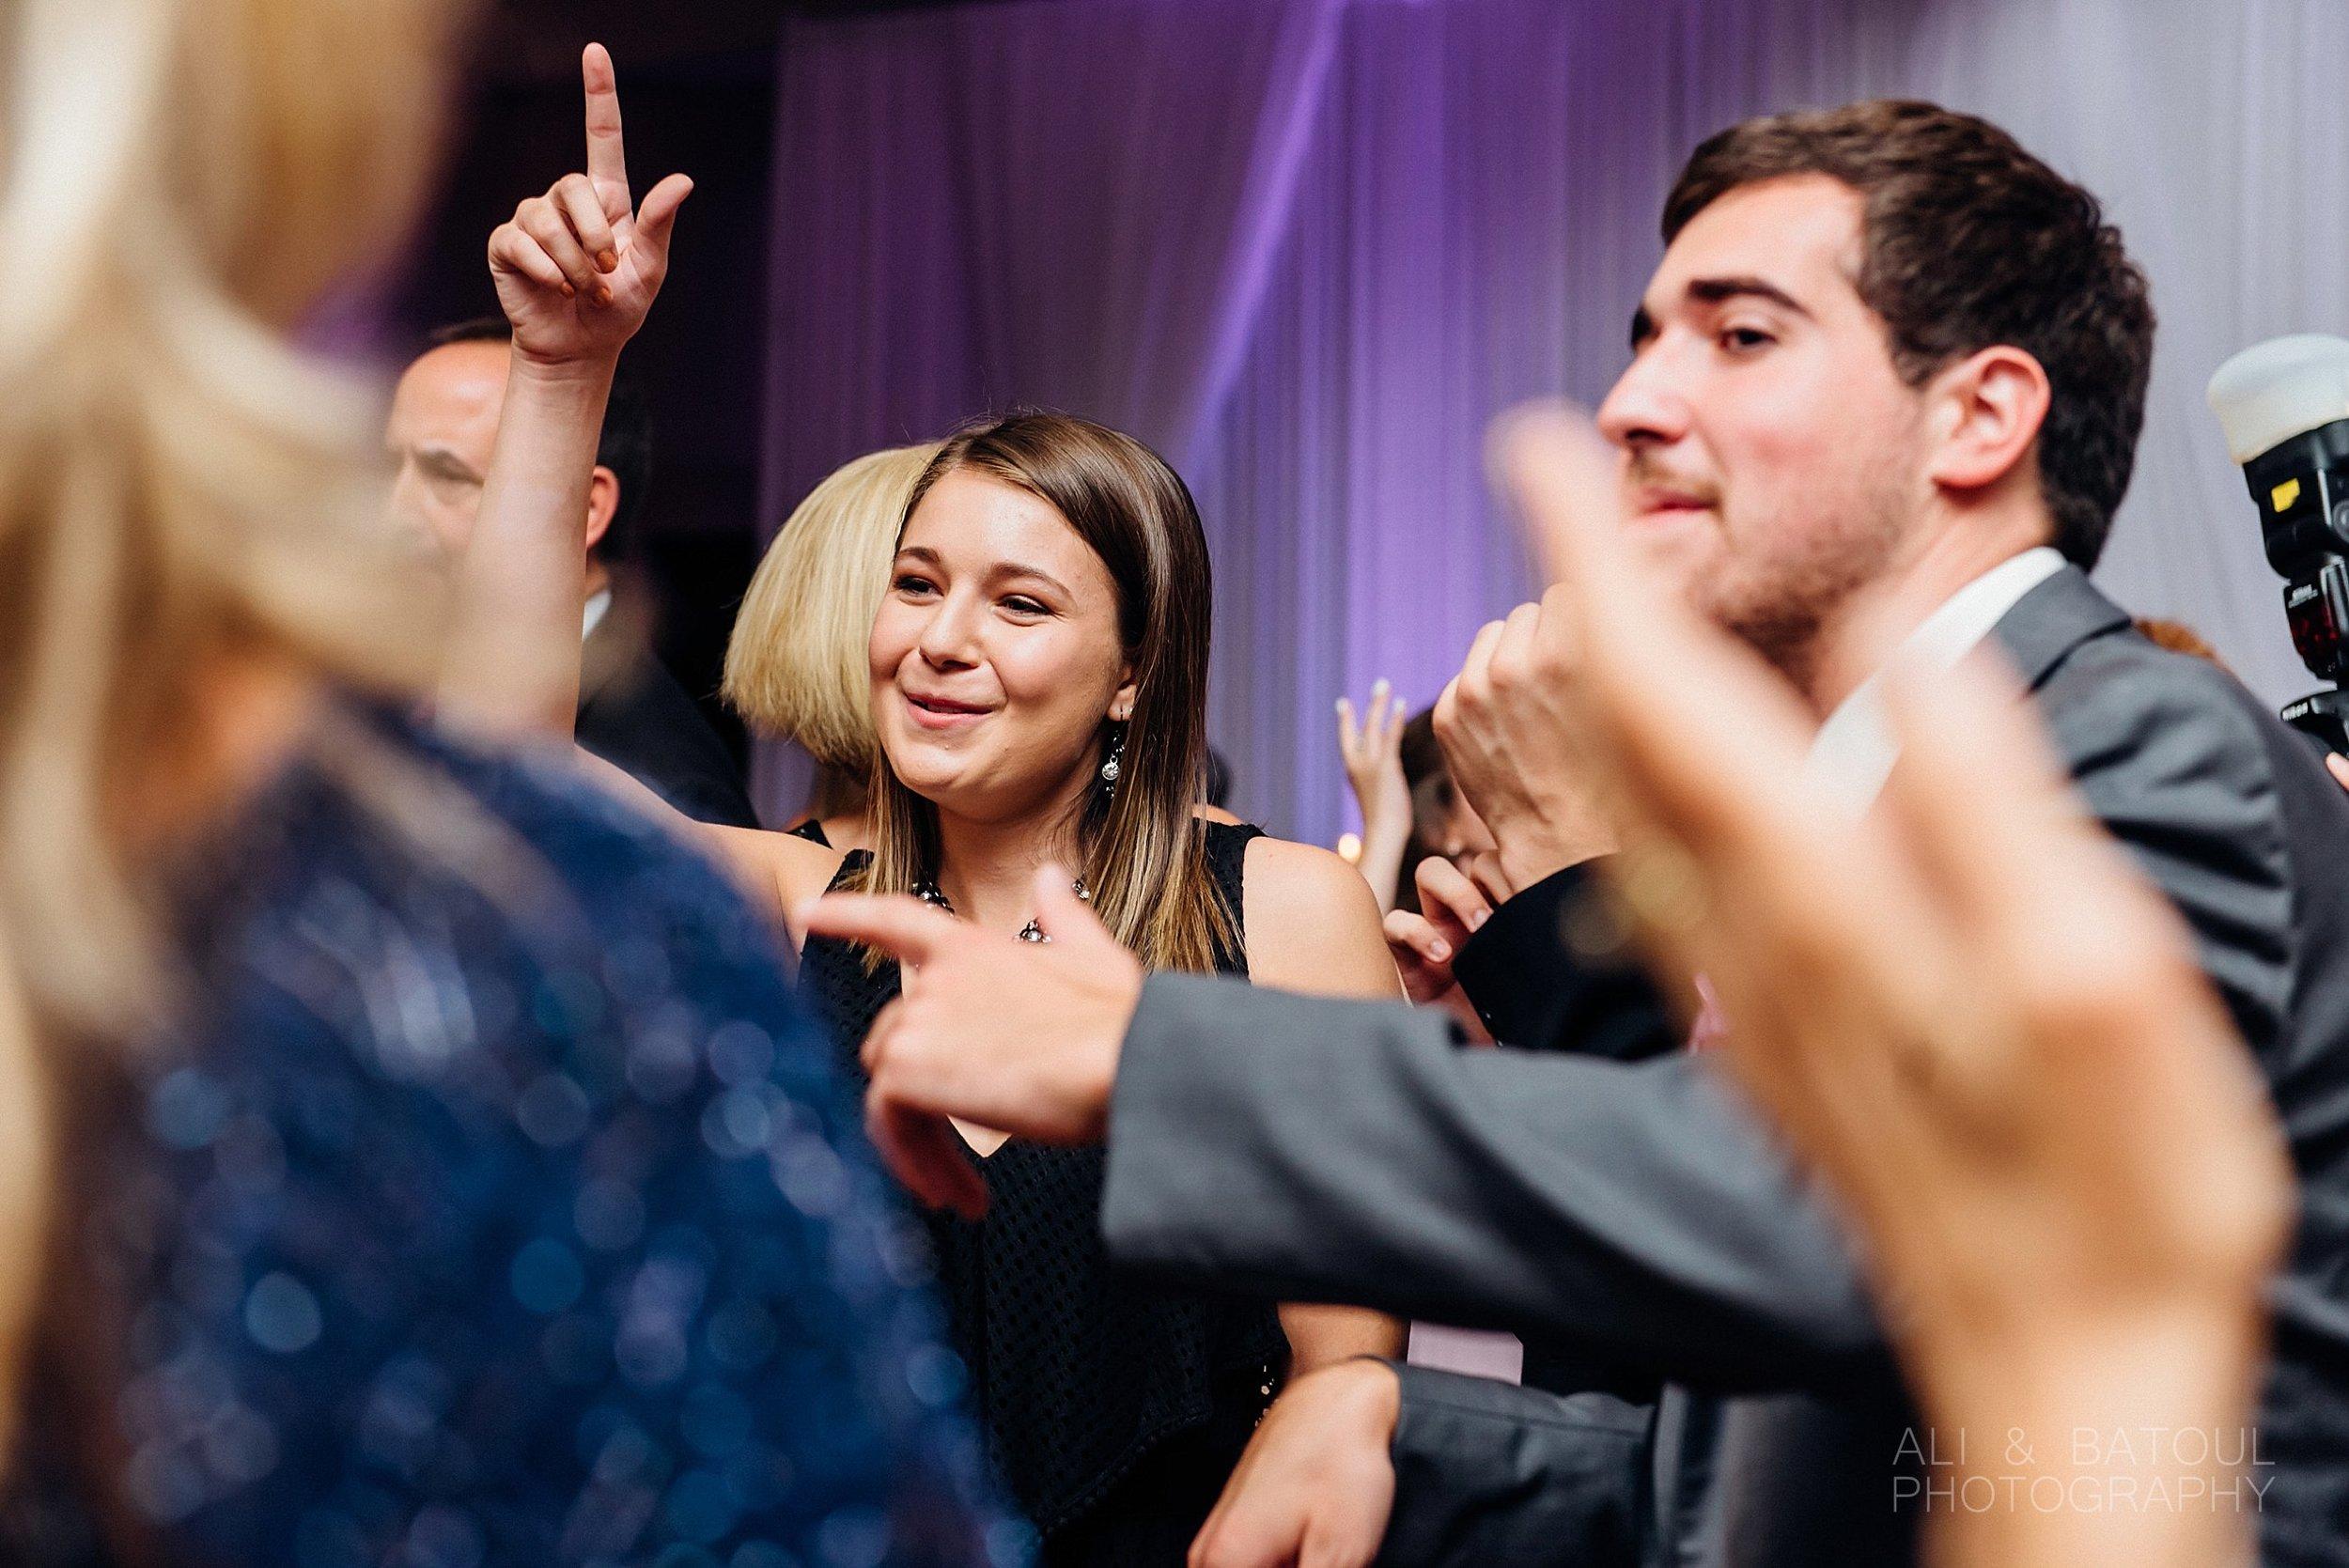 Ali and Batoul Photography - light, airy, indie documentary Ottawa wedding photographer_0072.jpg